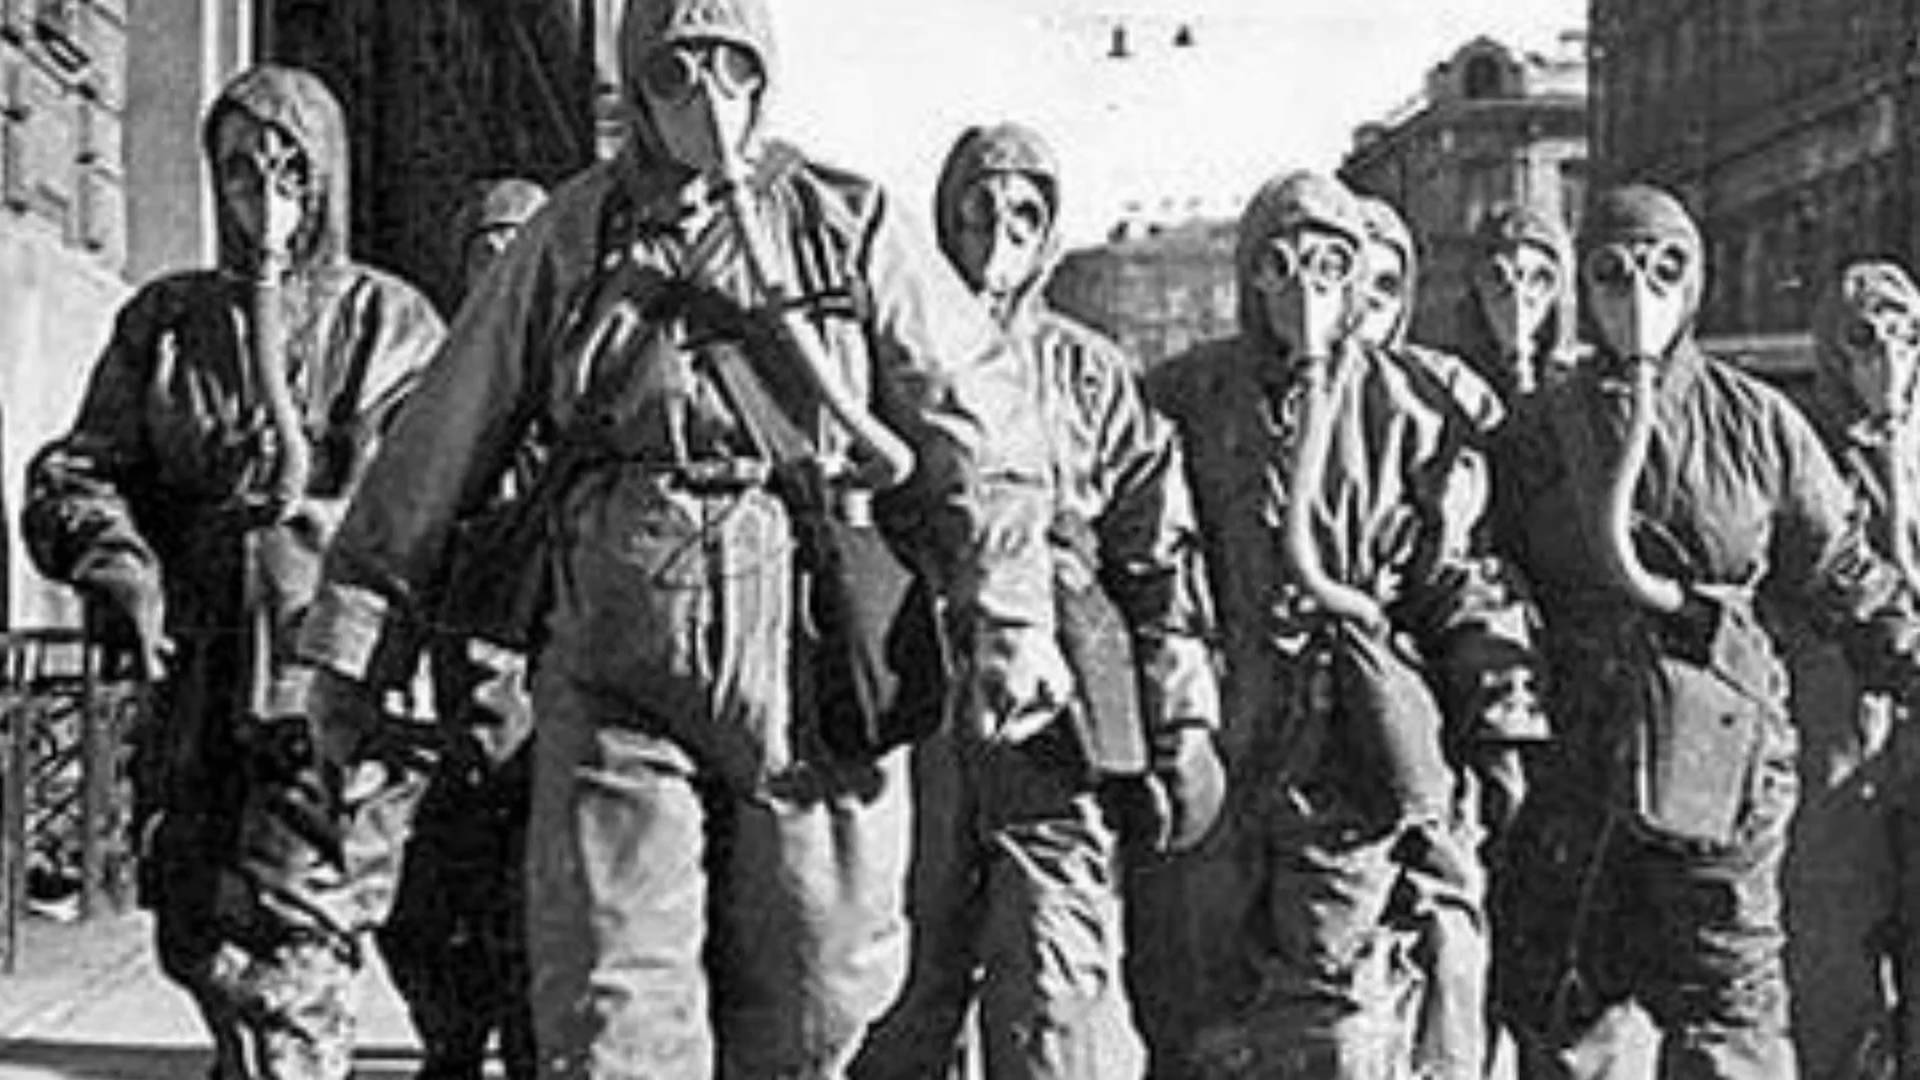 Emergency Live | Chernobyl, Lembrando Brave Firefighters e Forgotten Heroes image 2